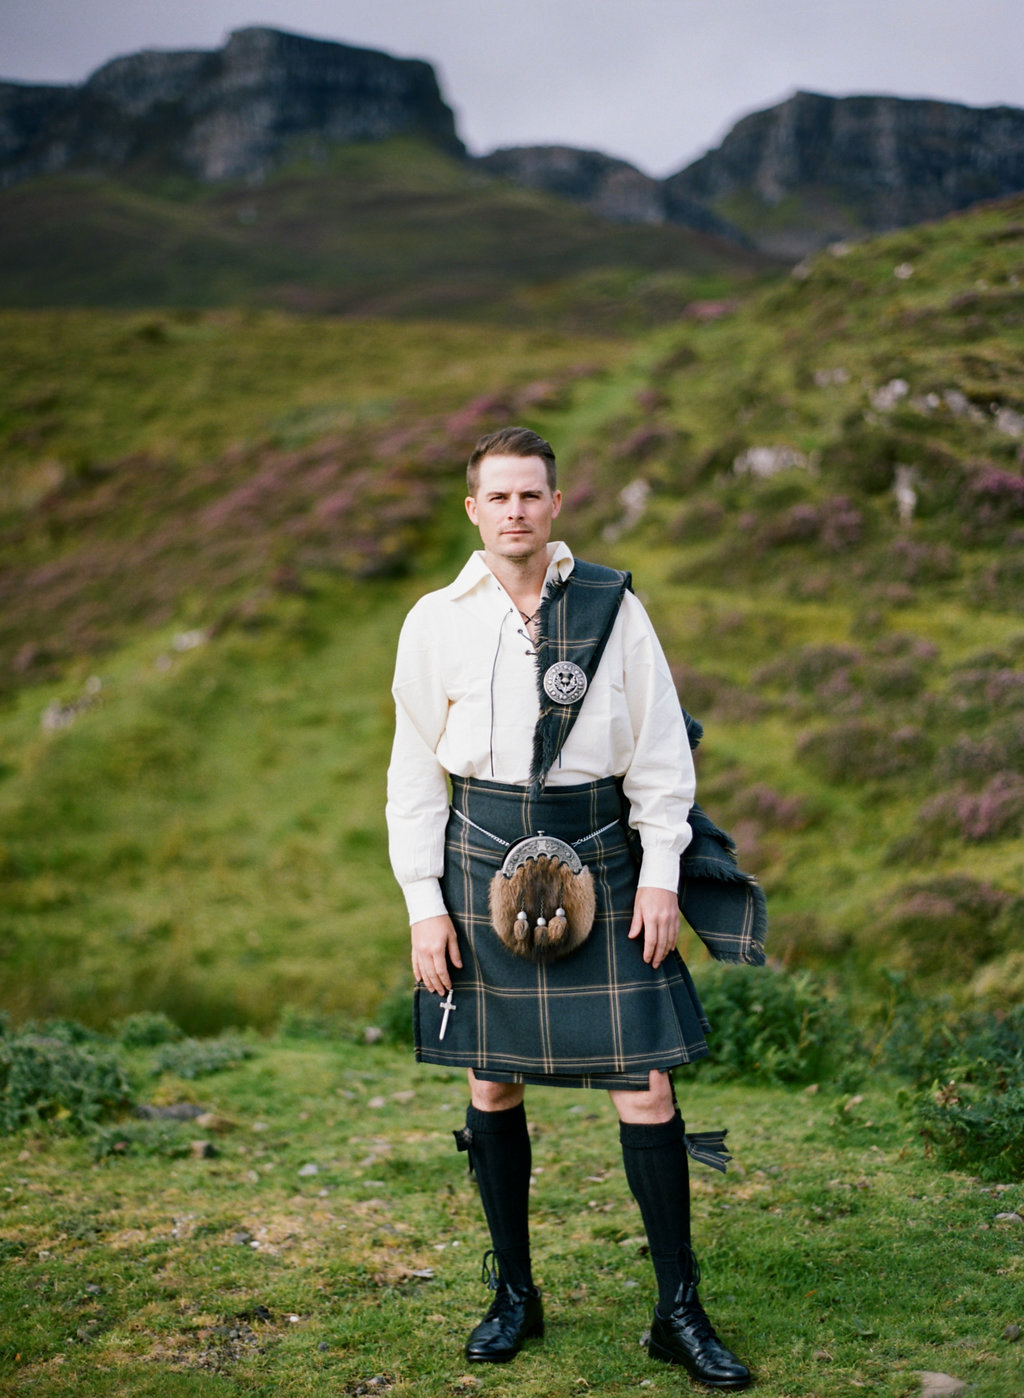 Scotland-Prewedding-highlands-castle-Engagment-Photos-Katie-Grant (11 of 139).jpg